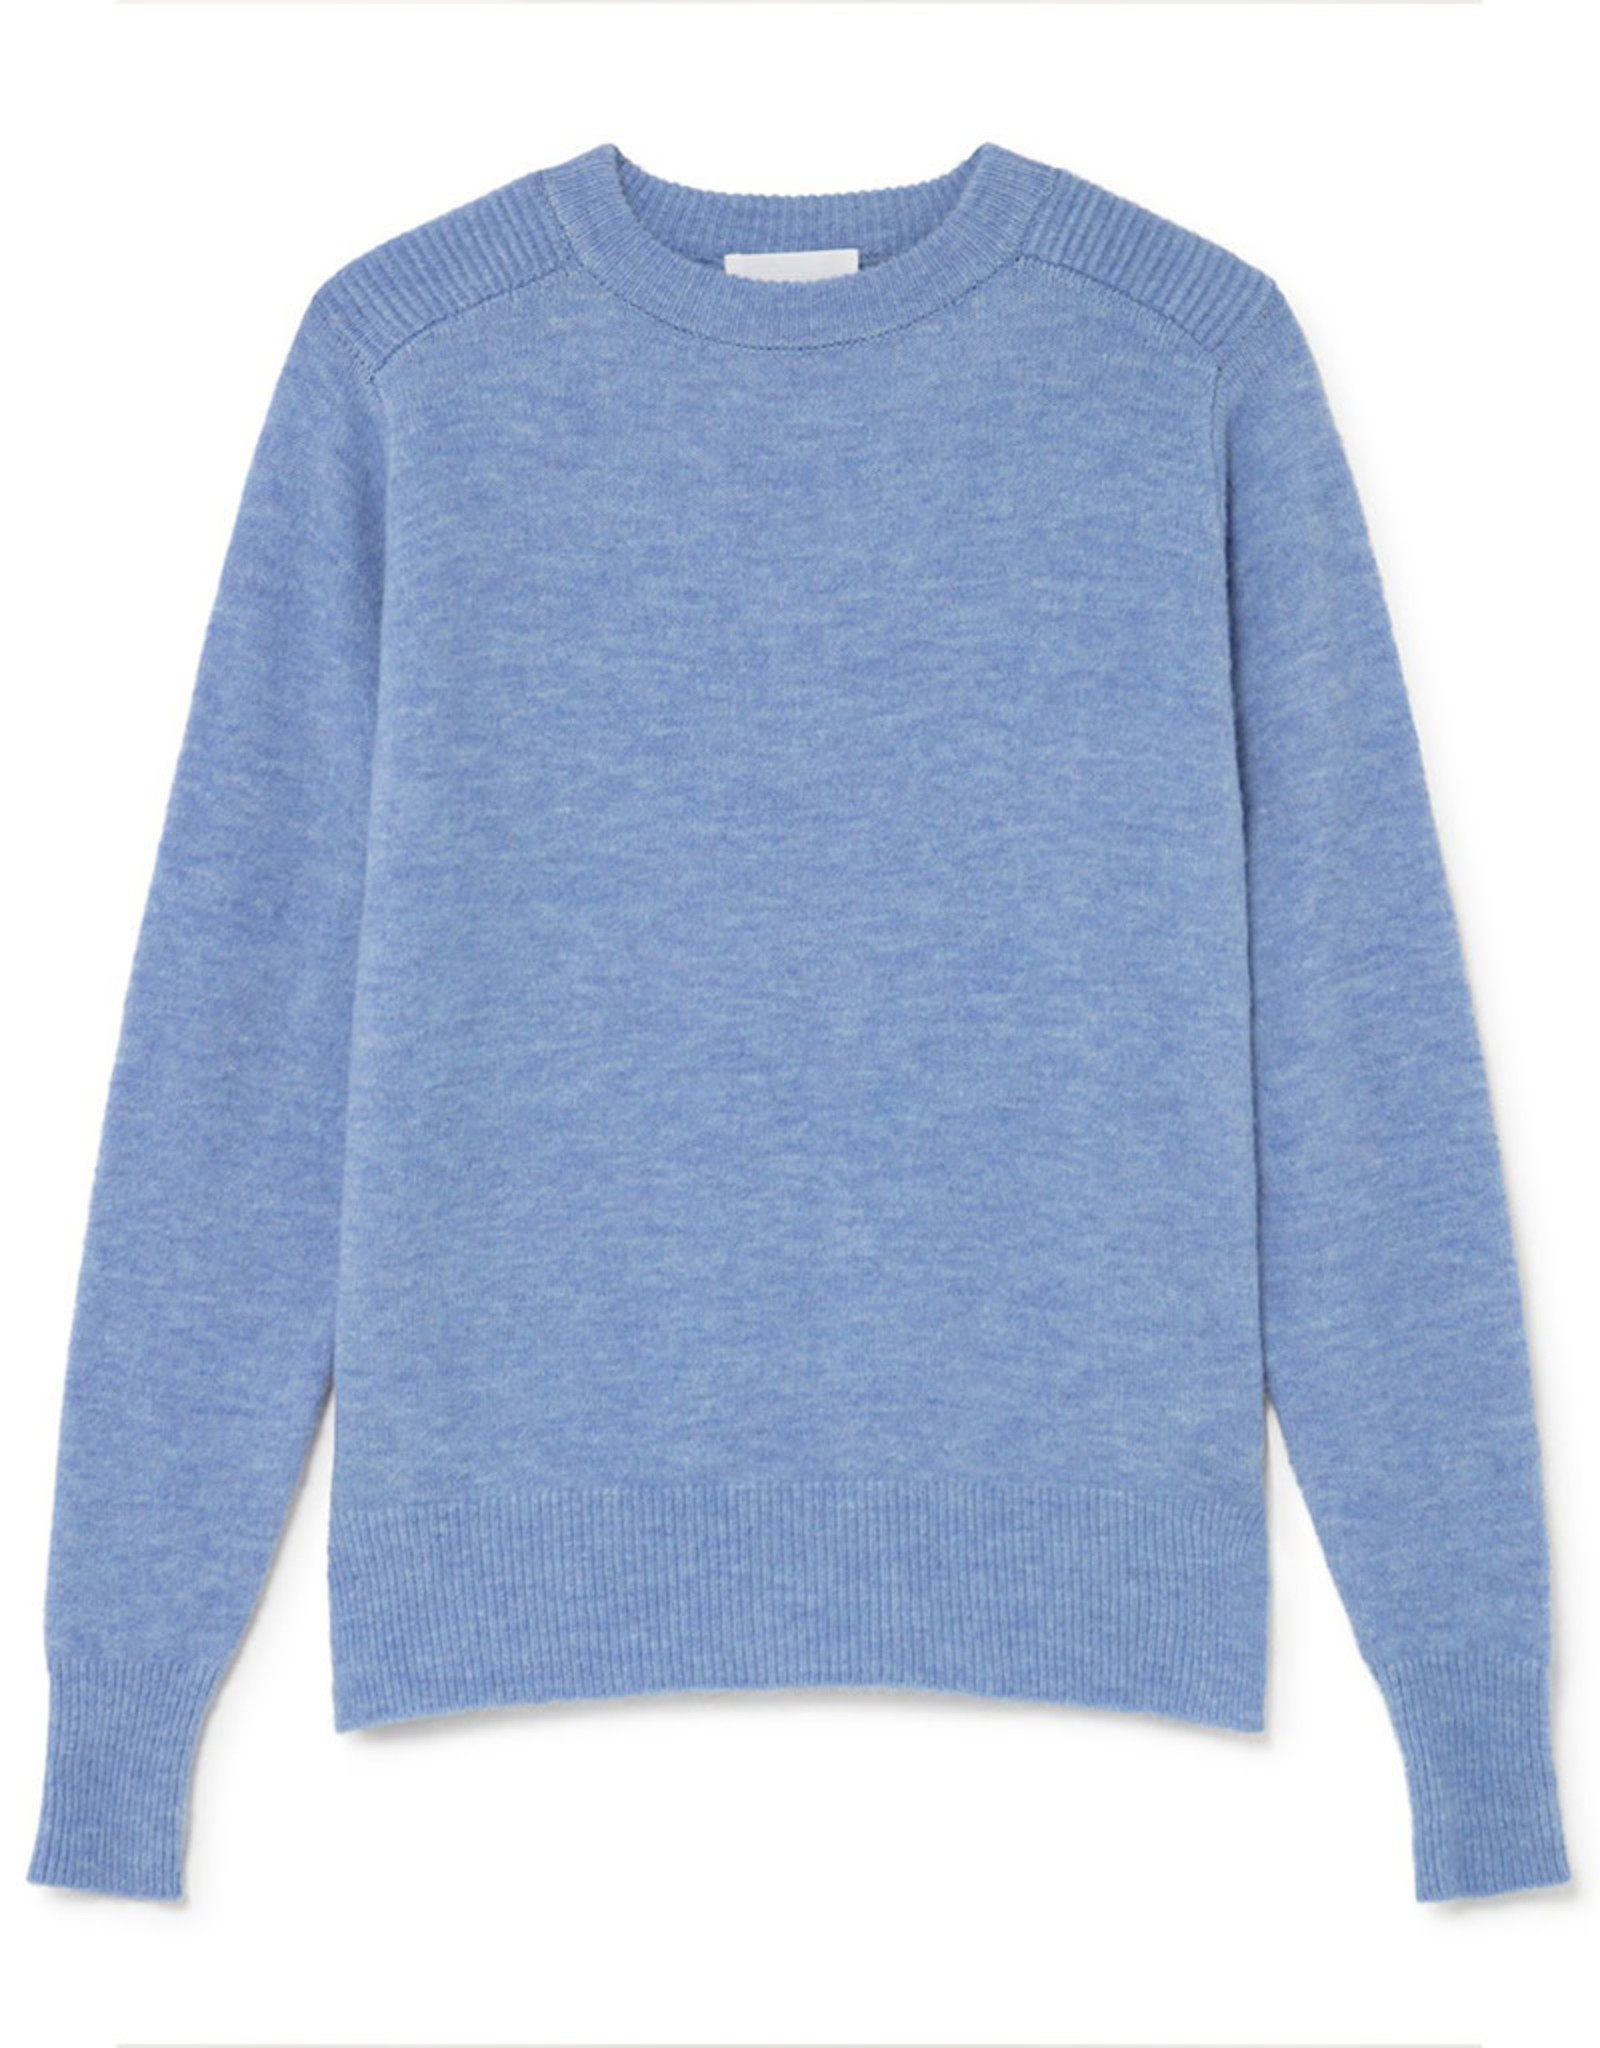 Sita Murt Jada Sweater